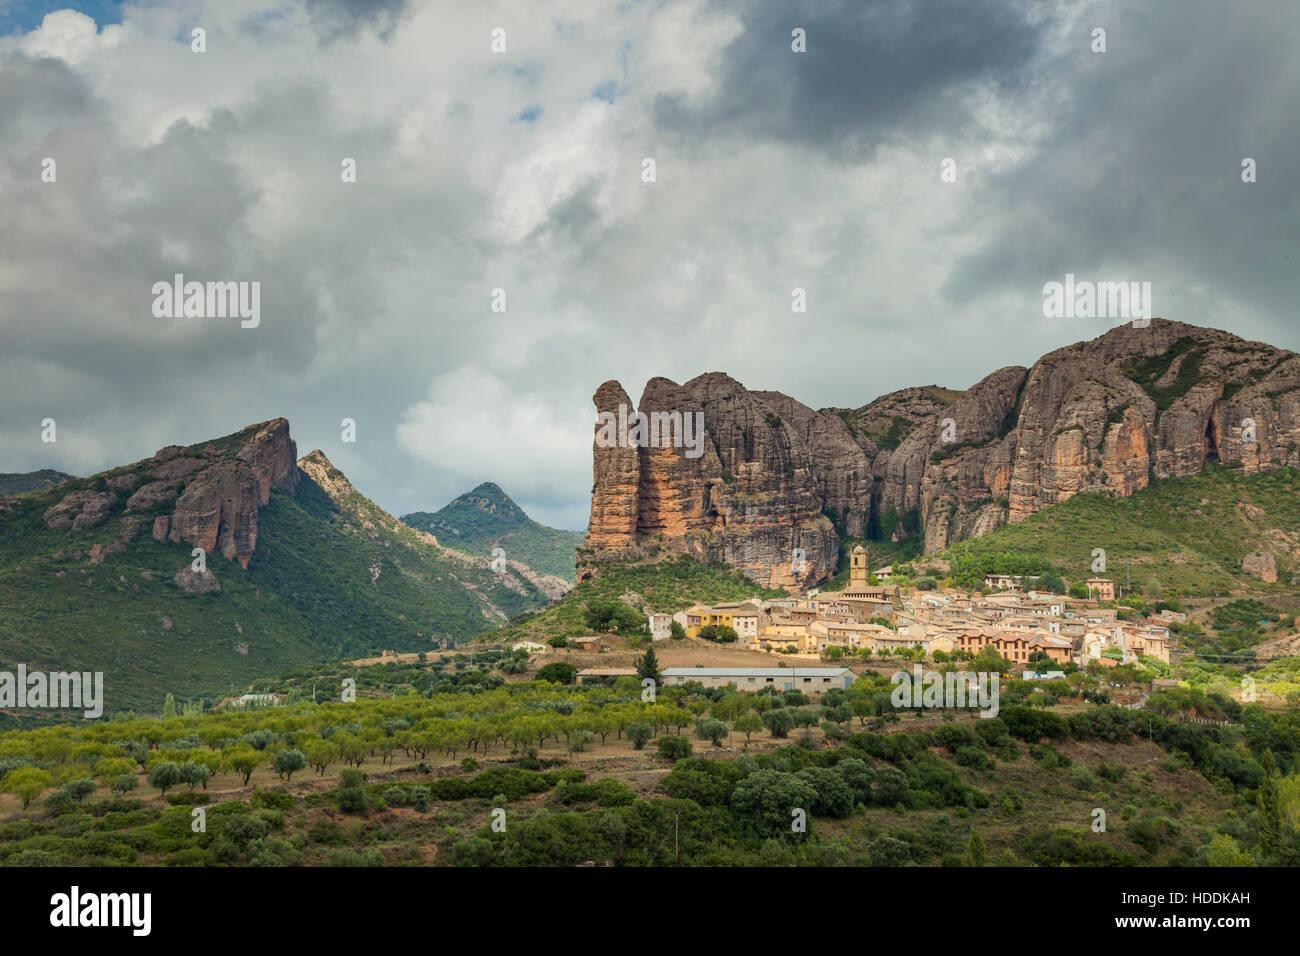 Stürmischer Himmel über Mallos de Agüero, einem berühmten Felsformation in Huesca, Aragon, Spanien. Stockbild